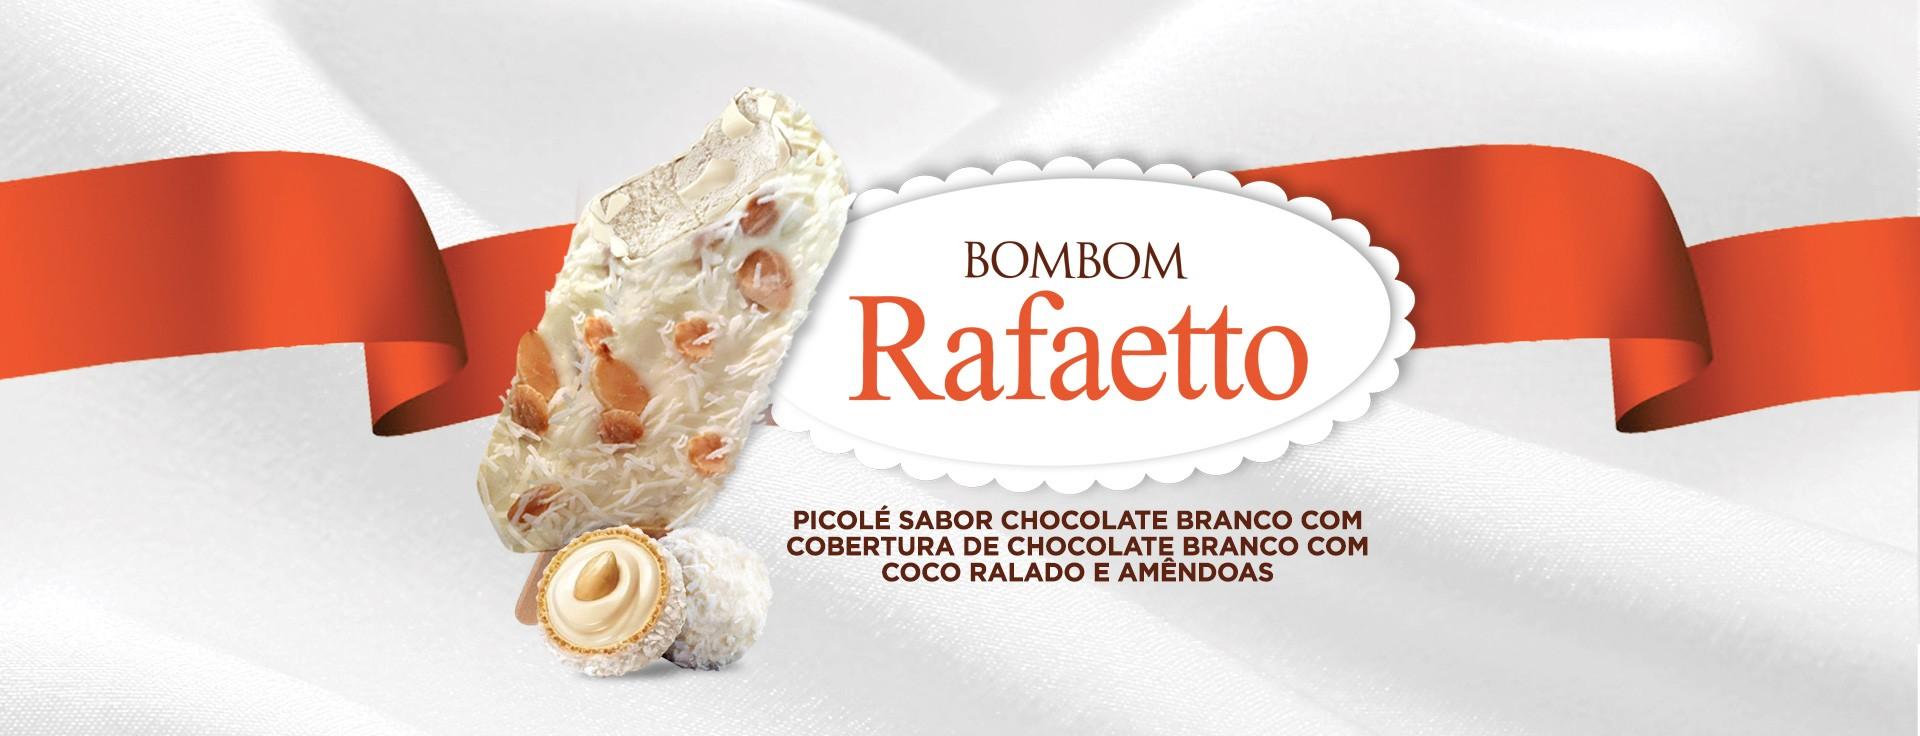 Rafaetto